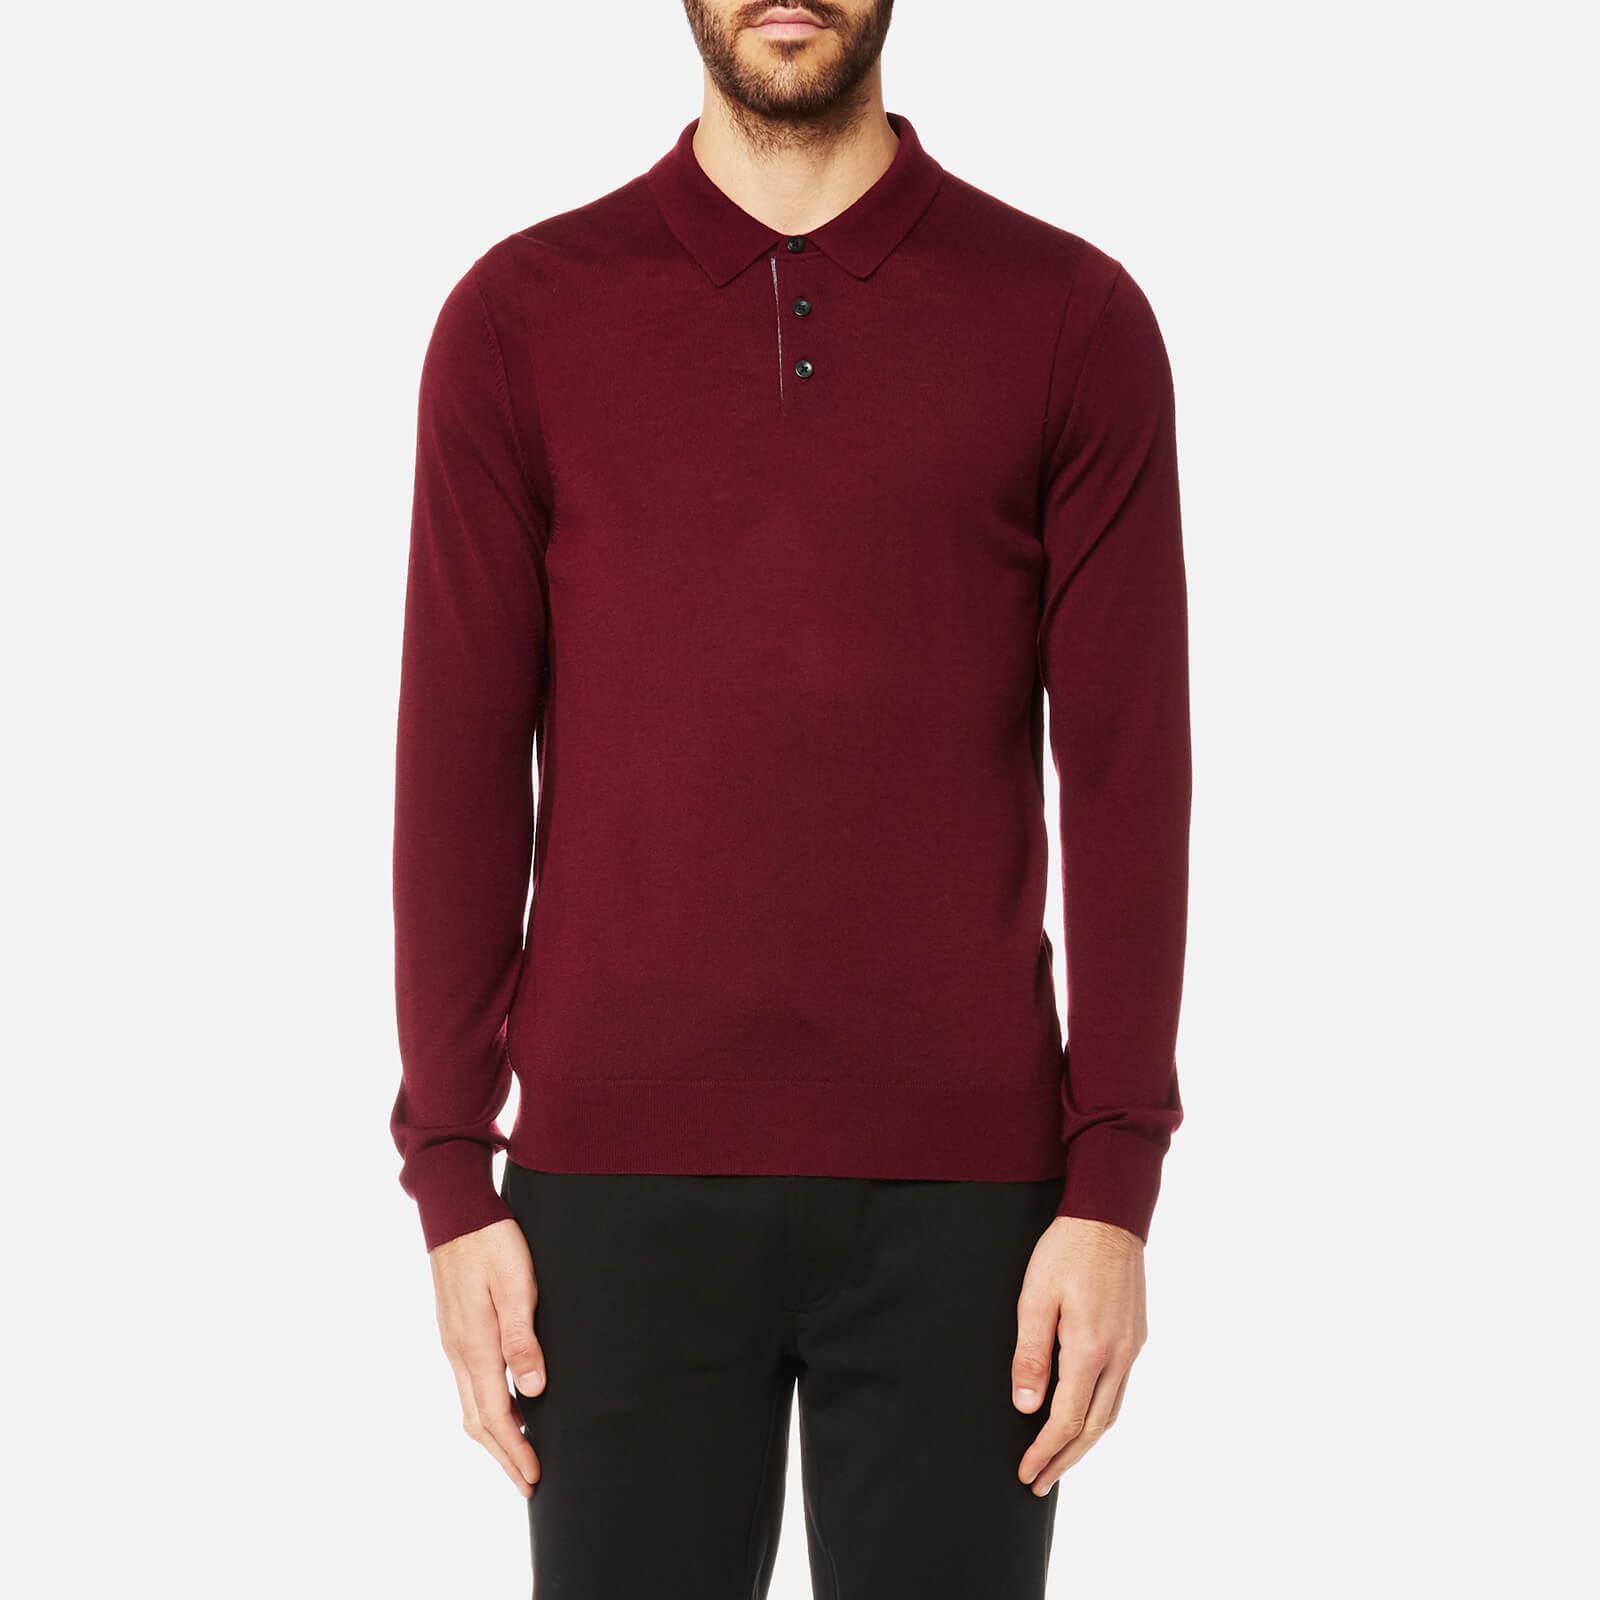 ab95b3c6 Michael Kors Men's Merino Long Sleeve Polo Shirt - Chianti - Free UK  Delivery over £50